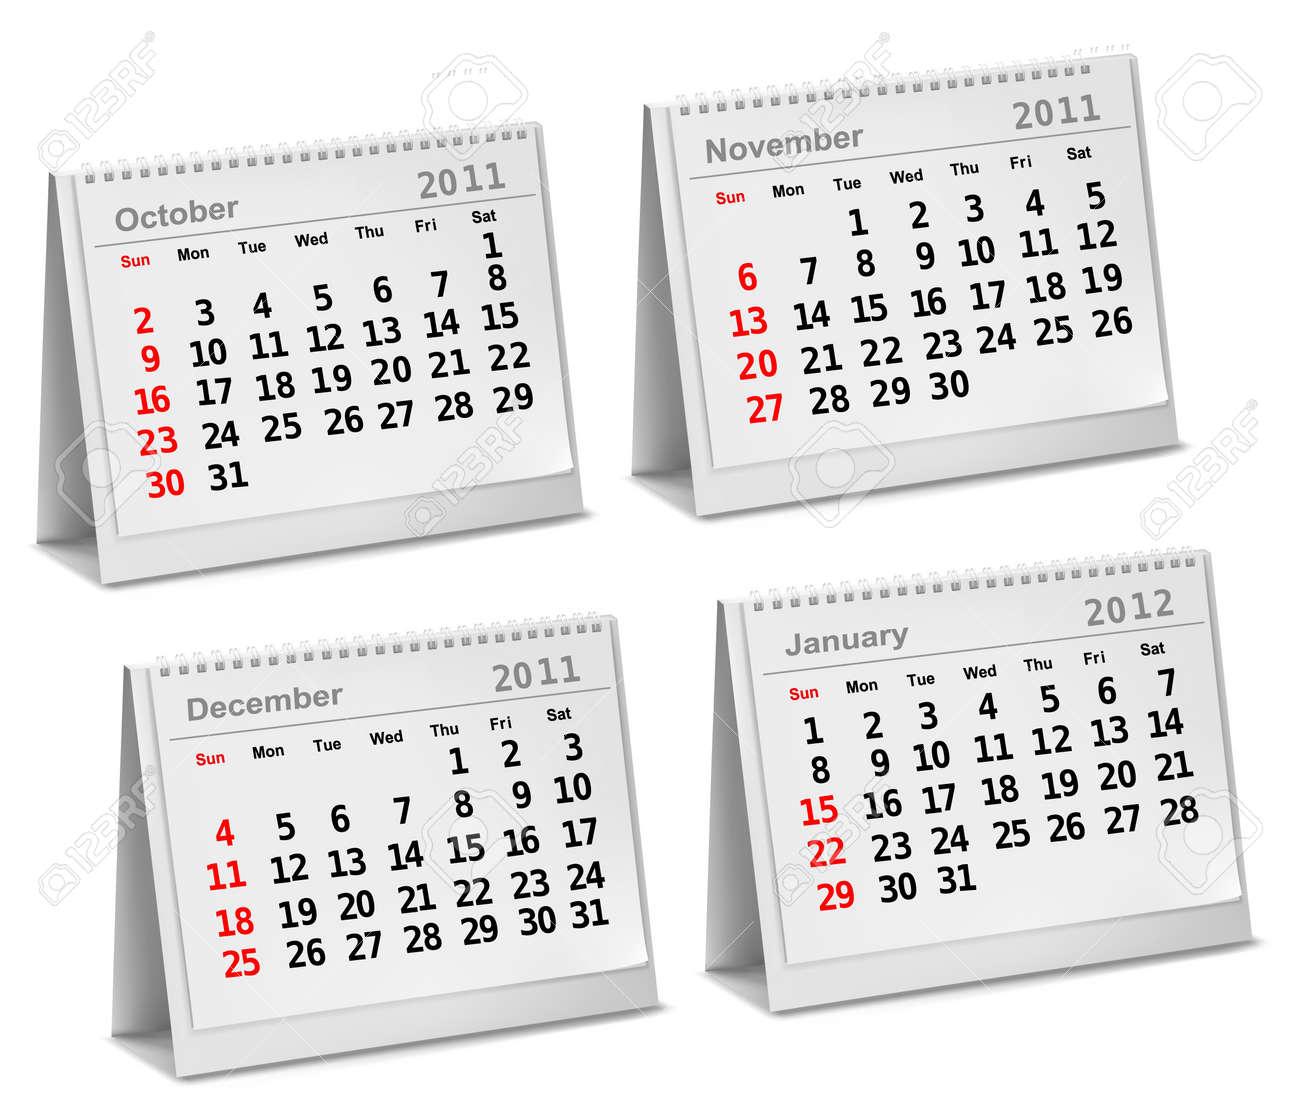 Desktop calendar 2011 - October, November, December, 2012 - January. Stock Vector - 11028002